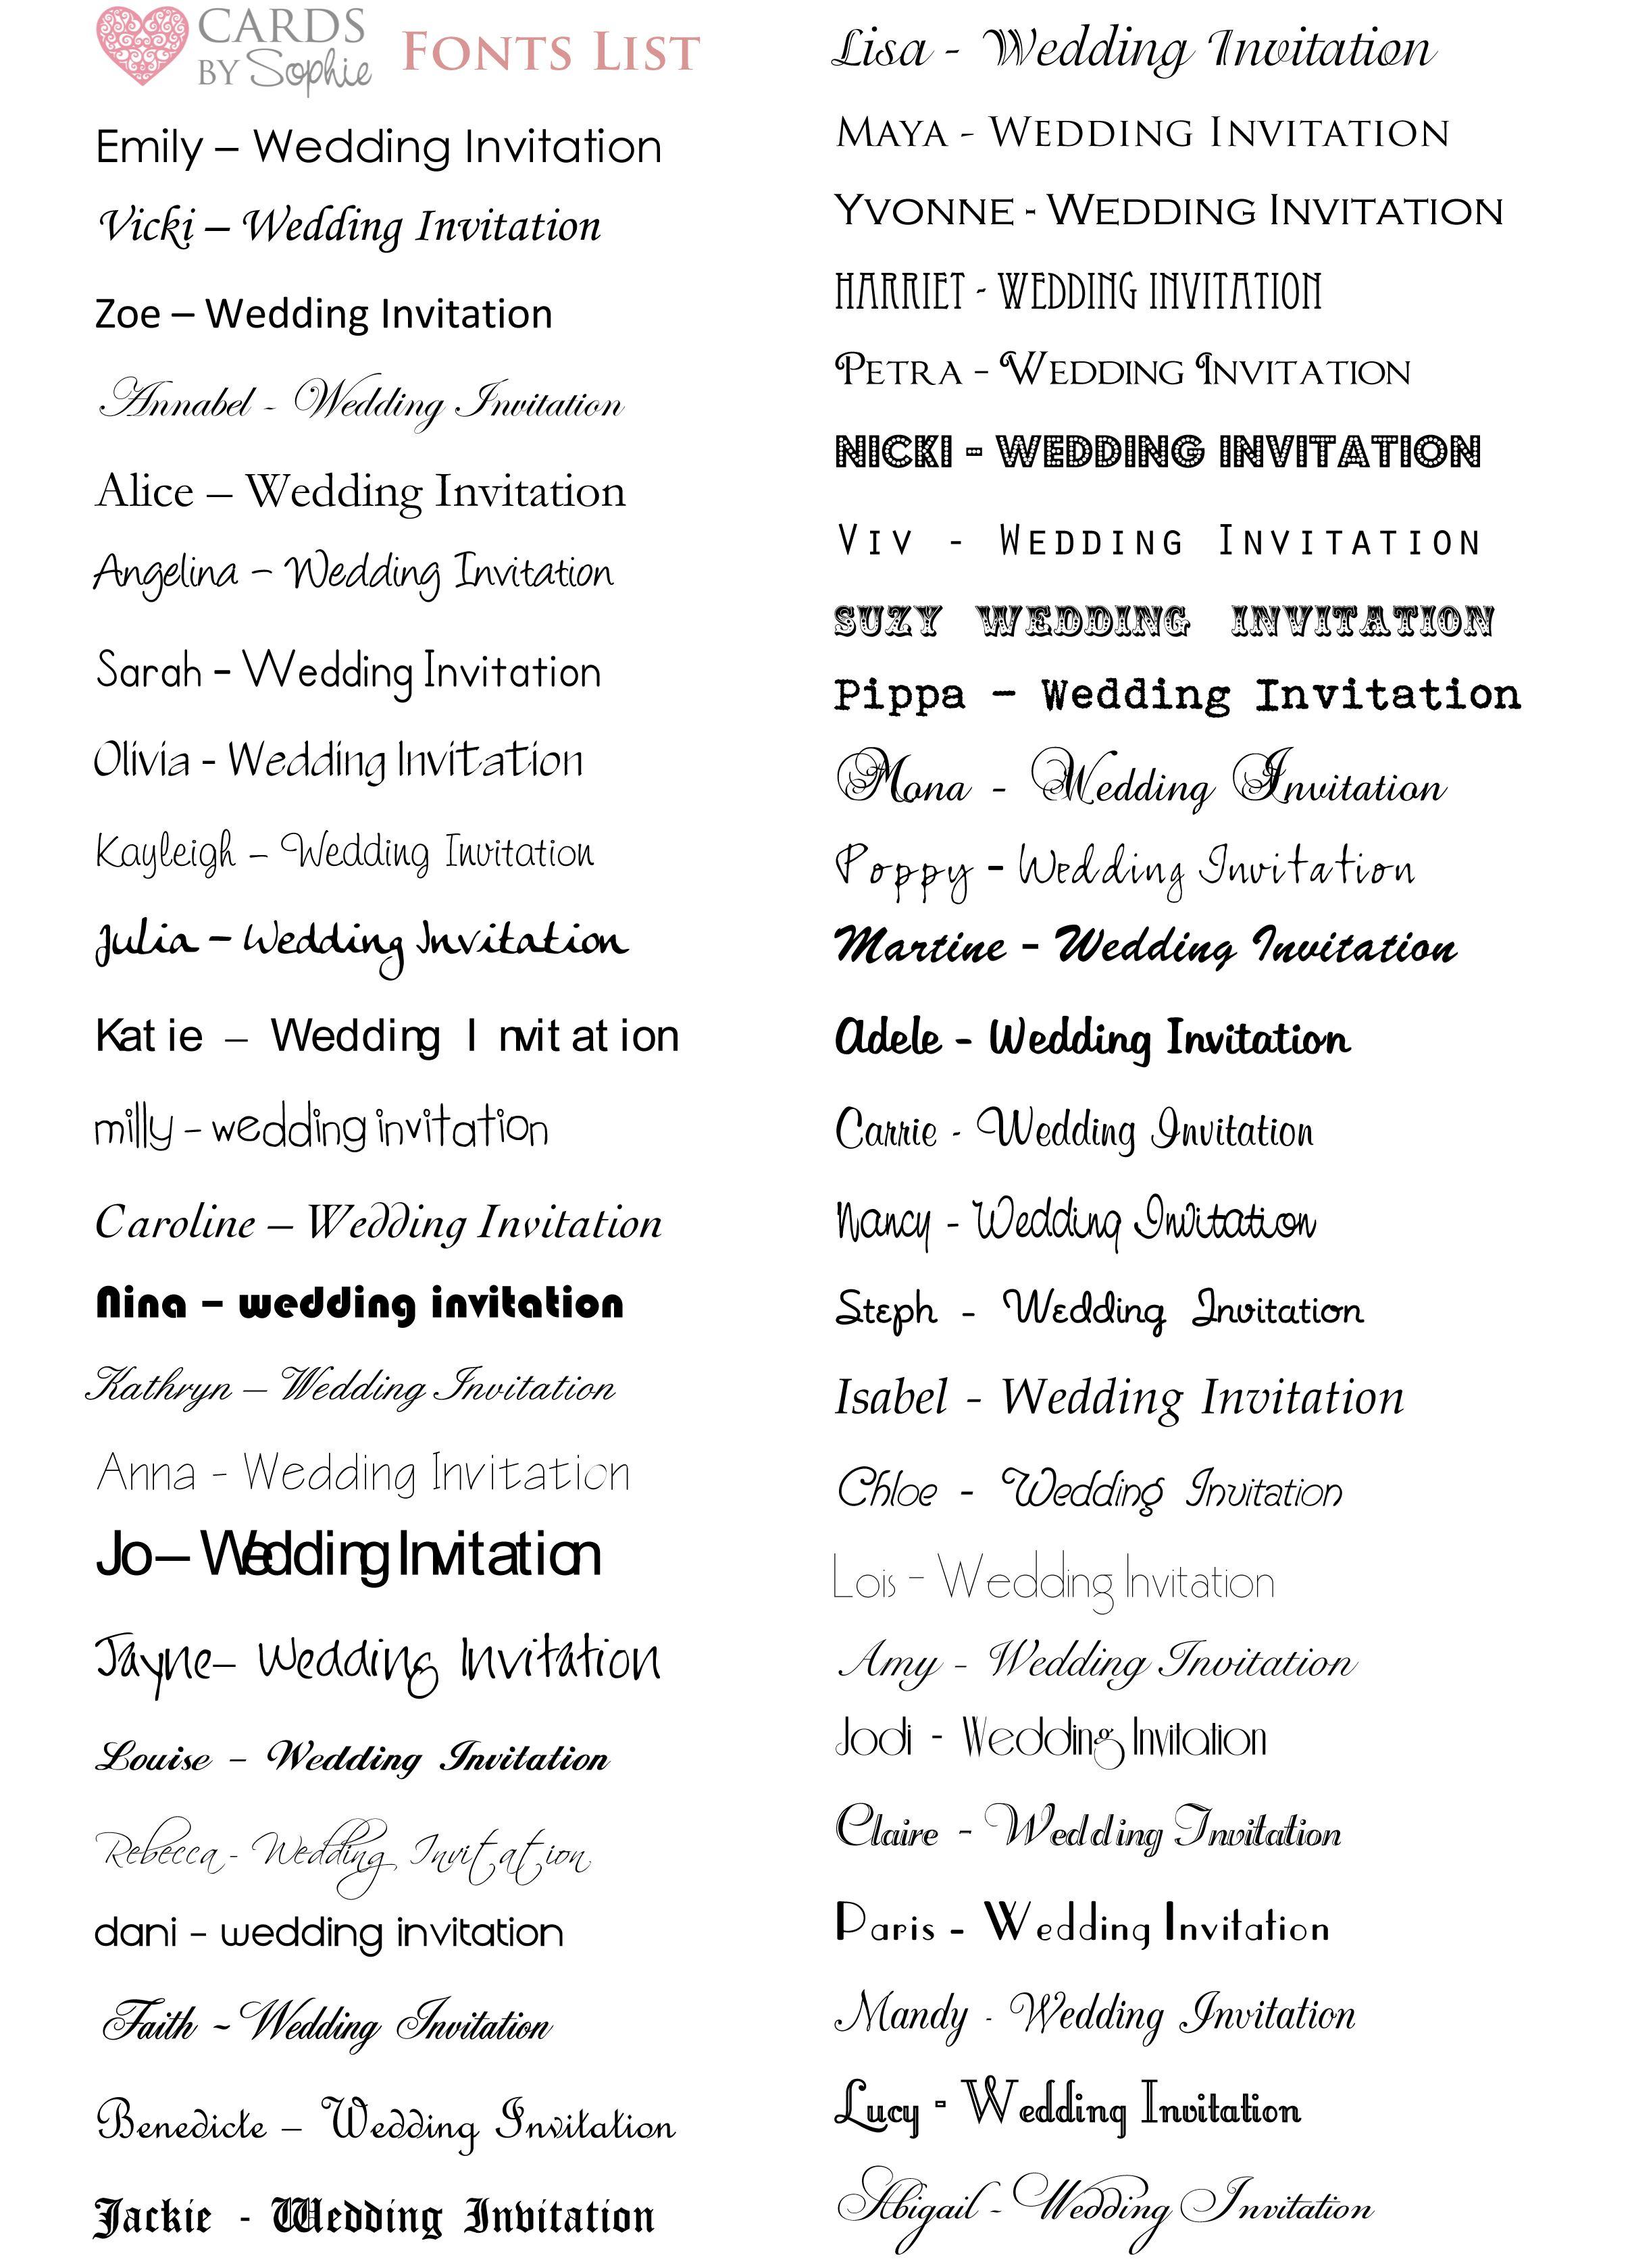 font styles wedding invitations - Google Search | Wedding ...